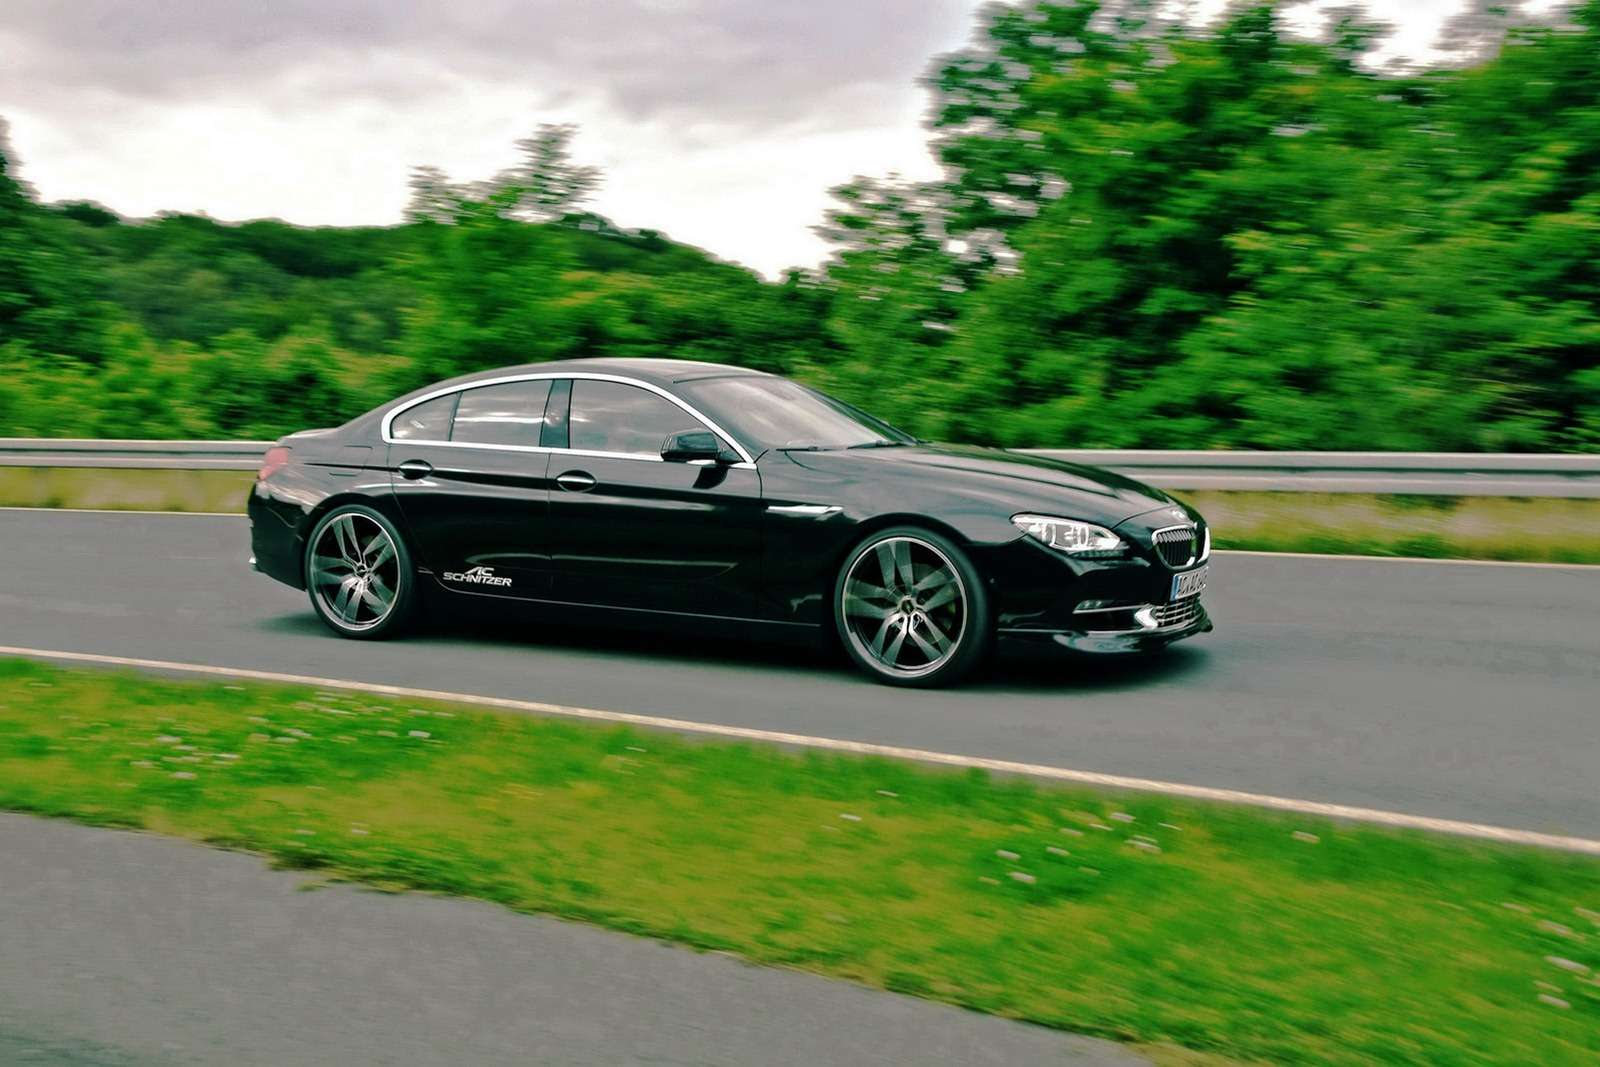 BMW serii 6 Gran Coupe AC Schnitzer